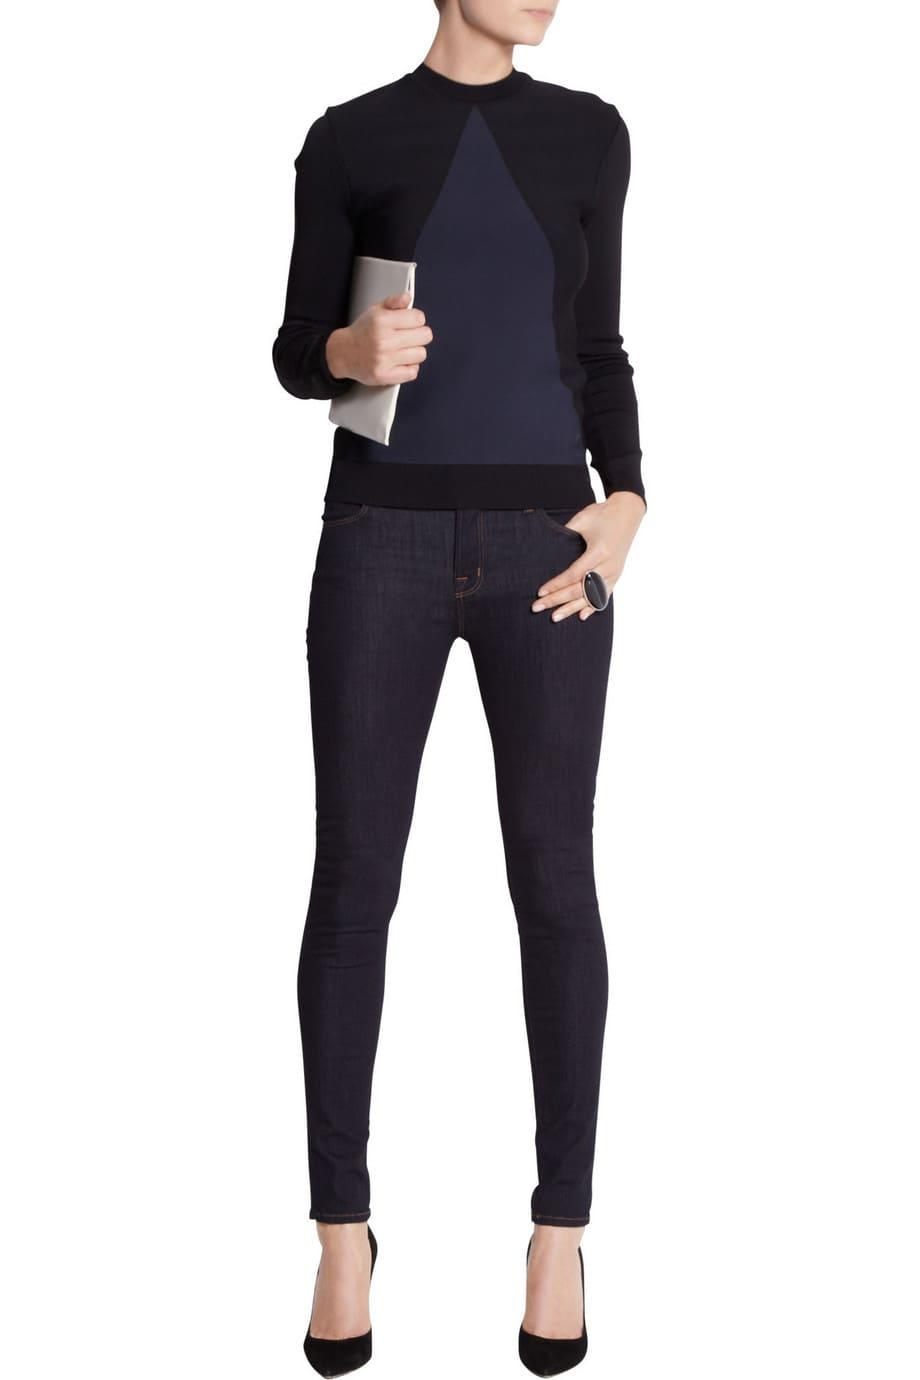 image Arborer le look de (Black Widow) Natasha Romanoff en jeans J Brand 25